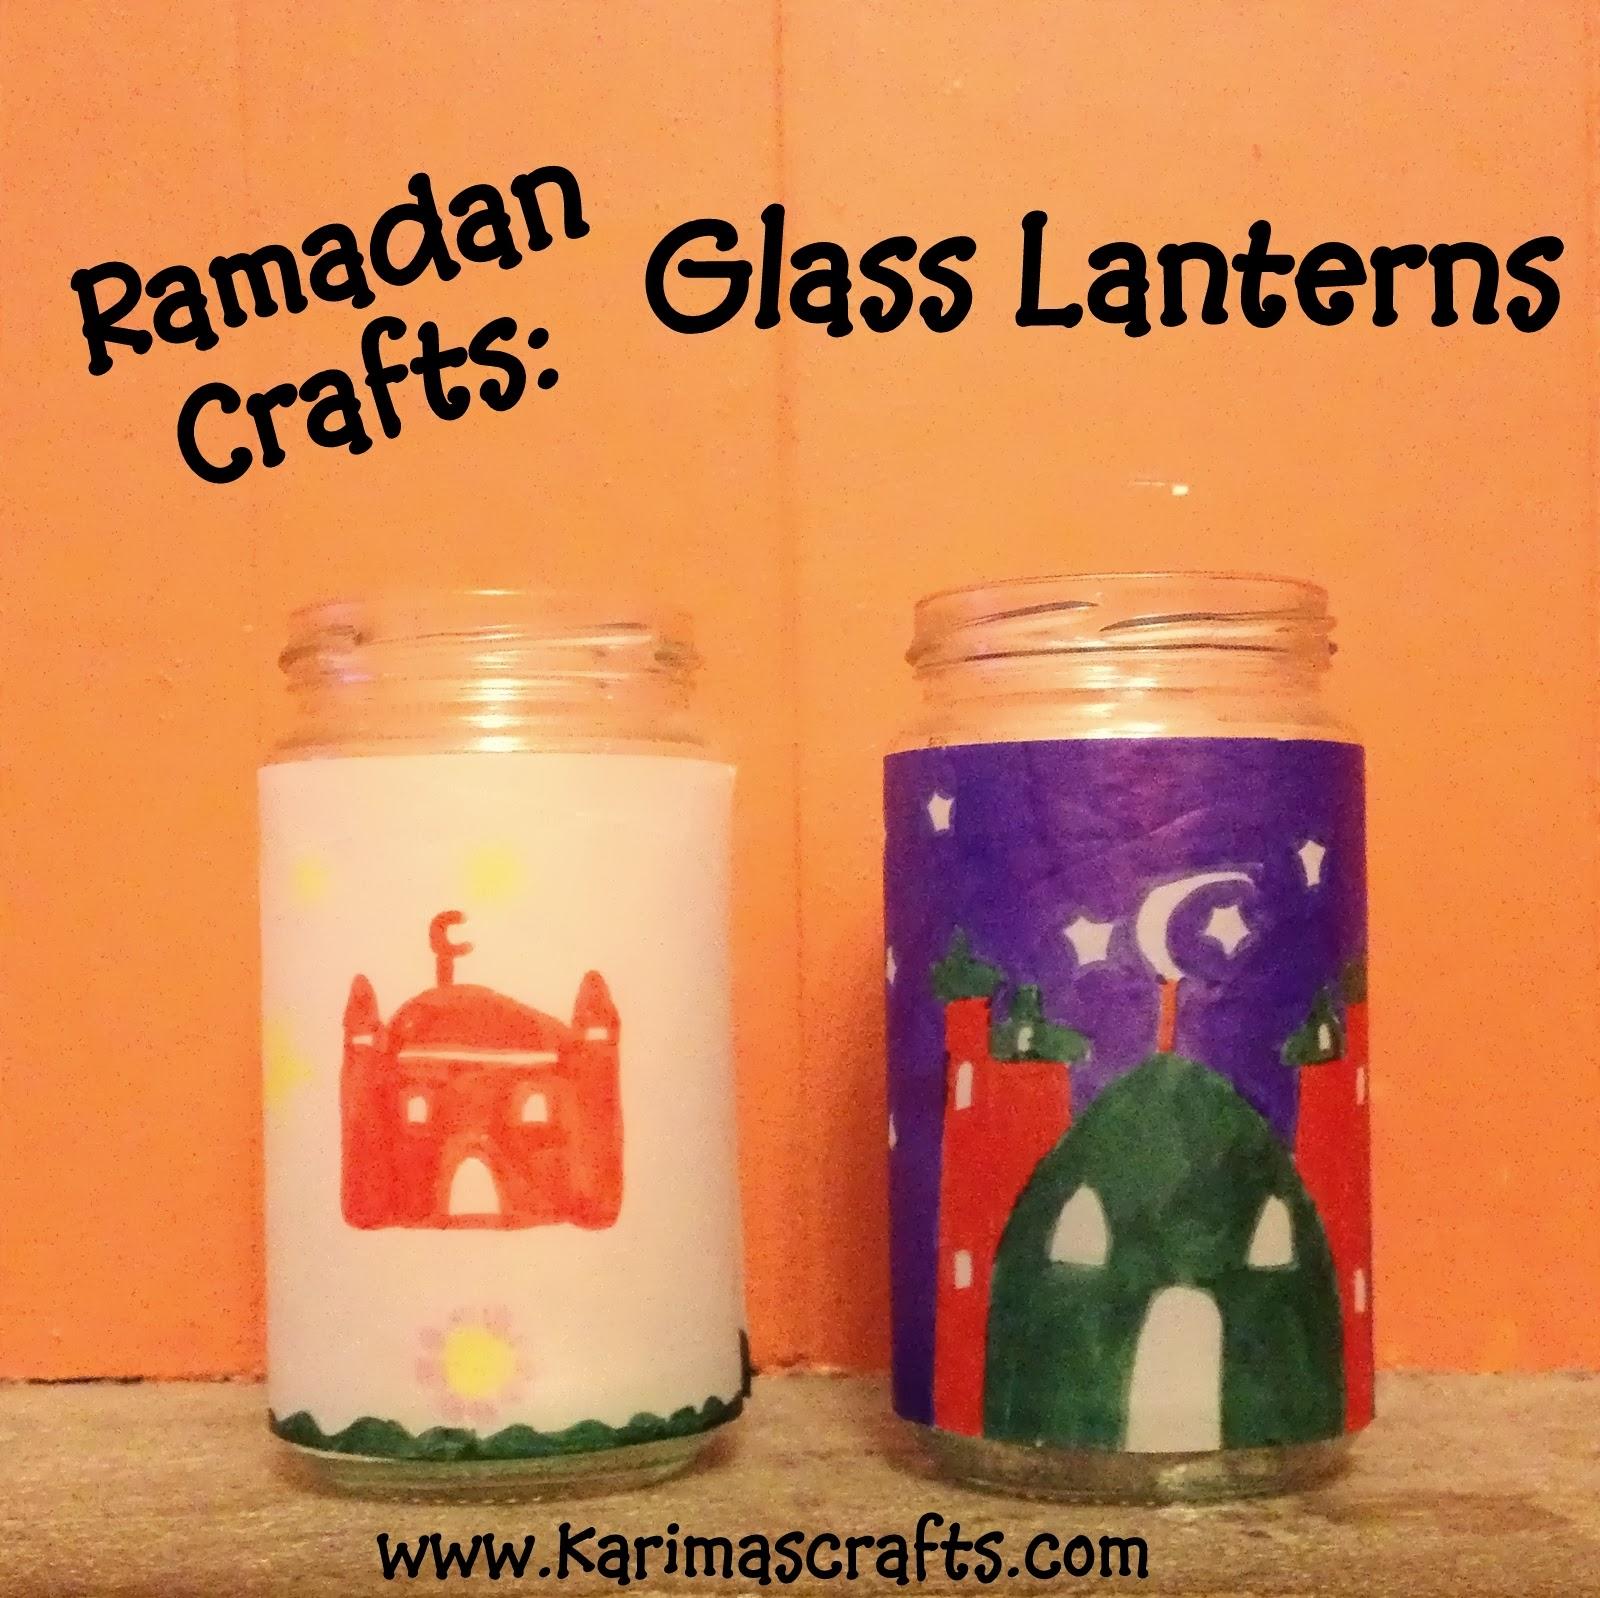 ramadan crafts glass lantern muslim islamic